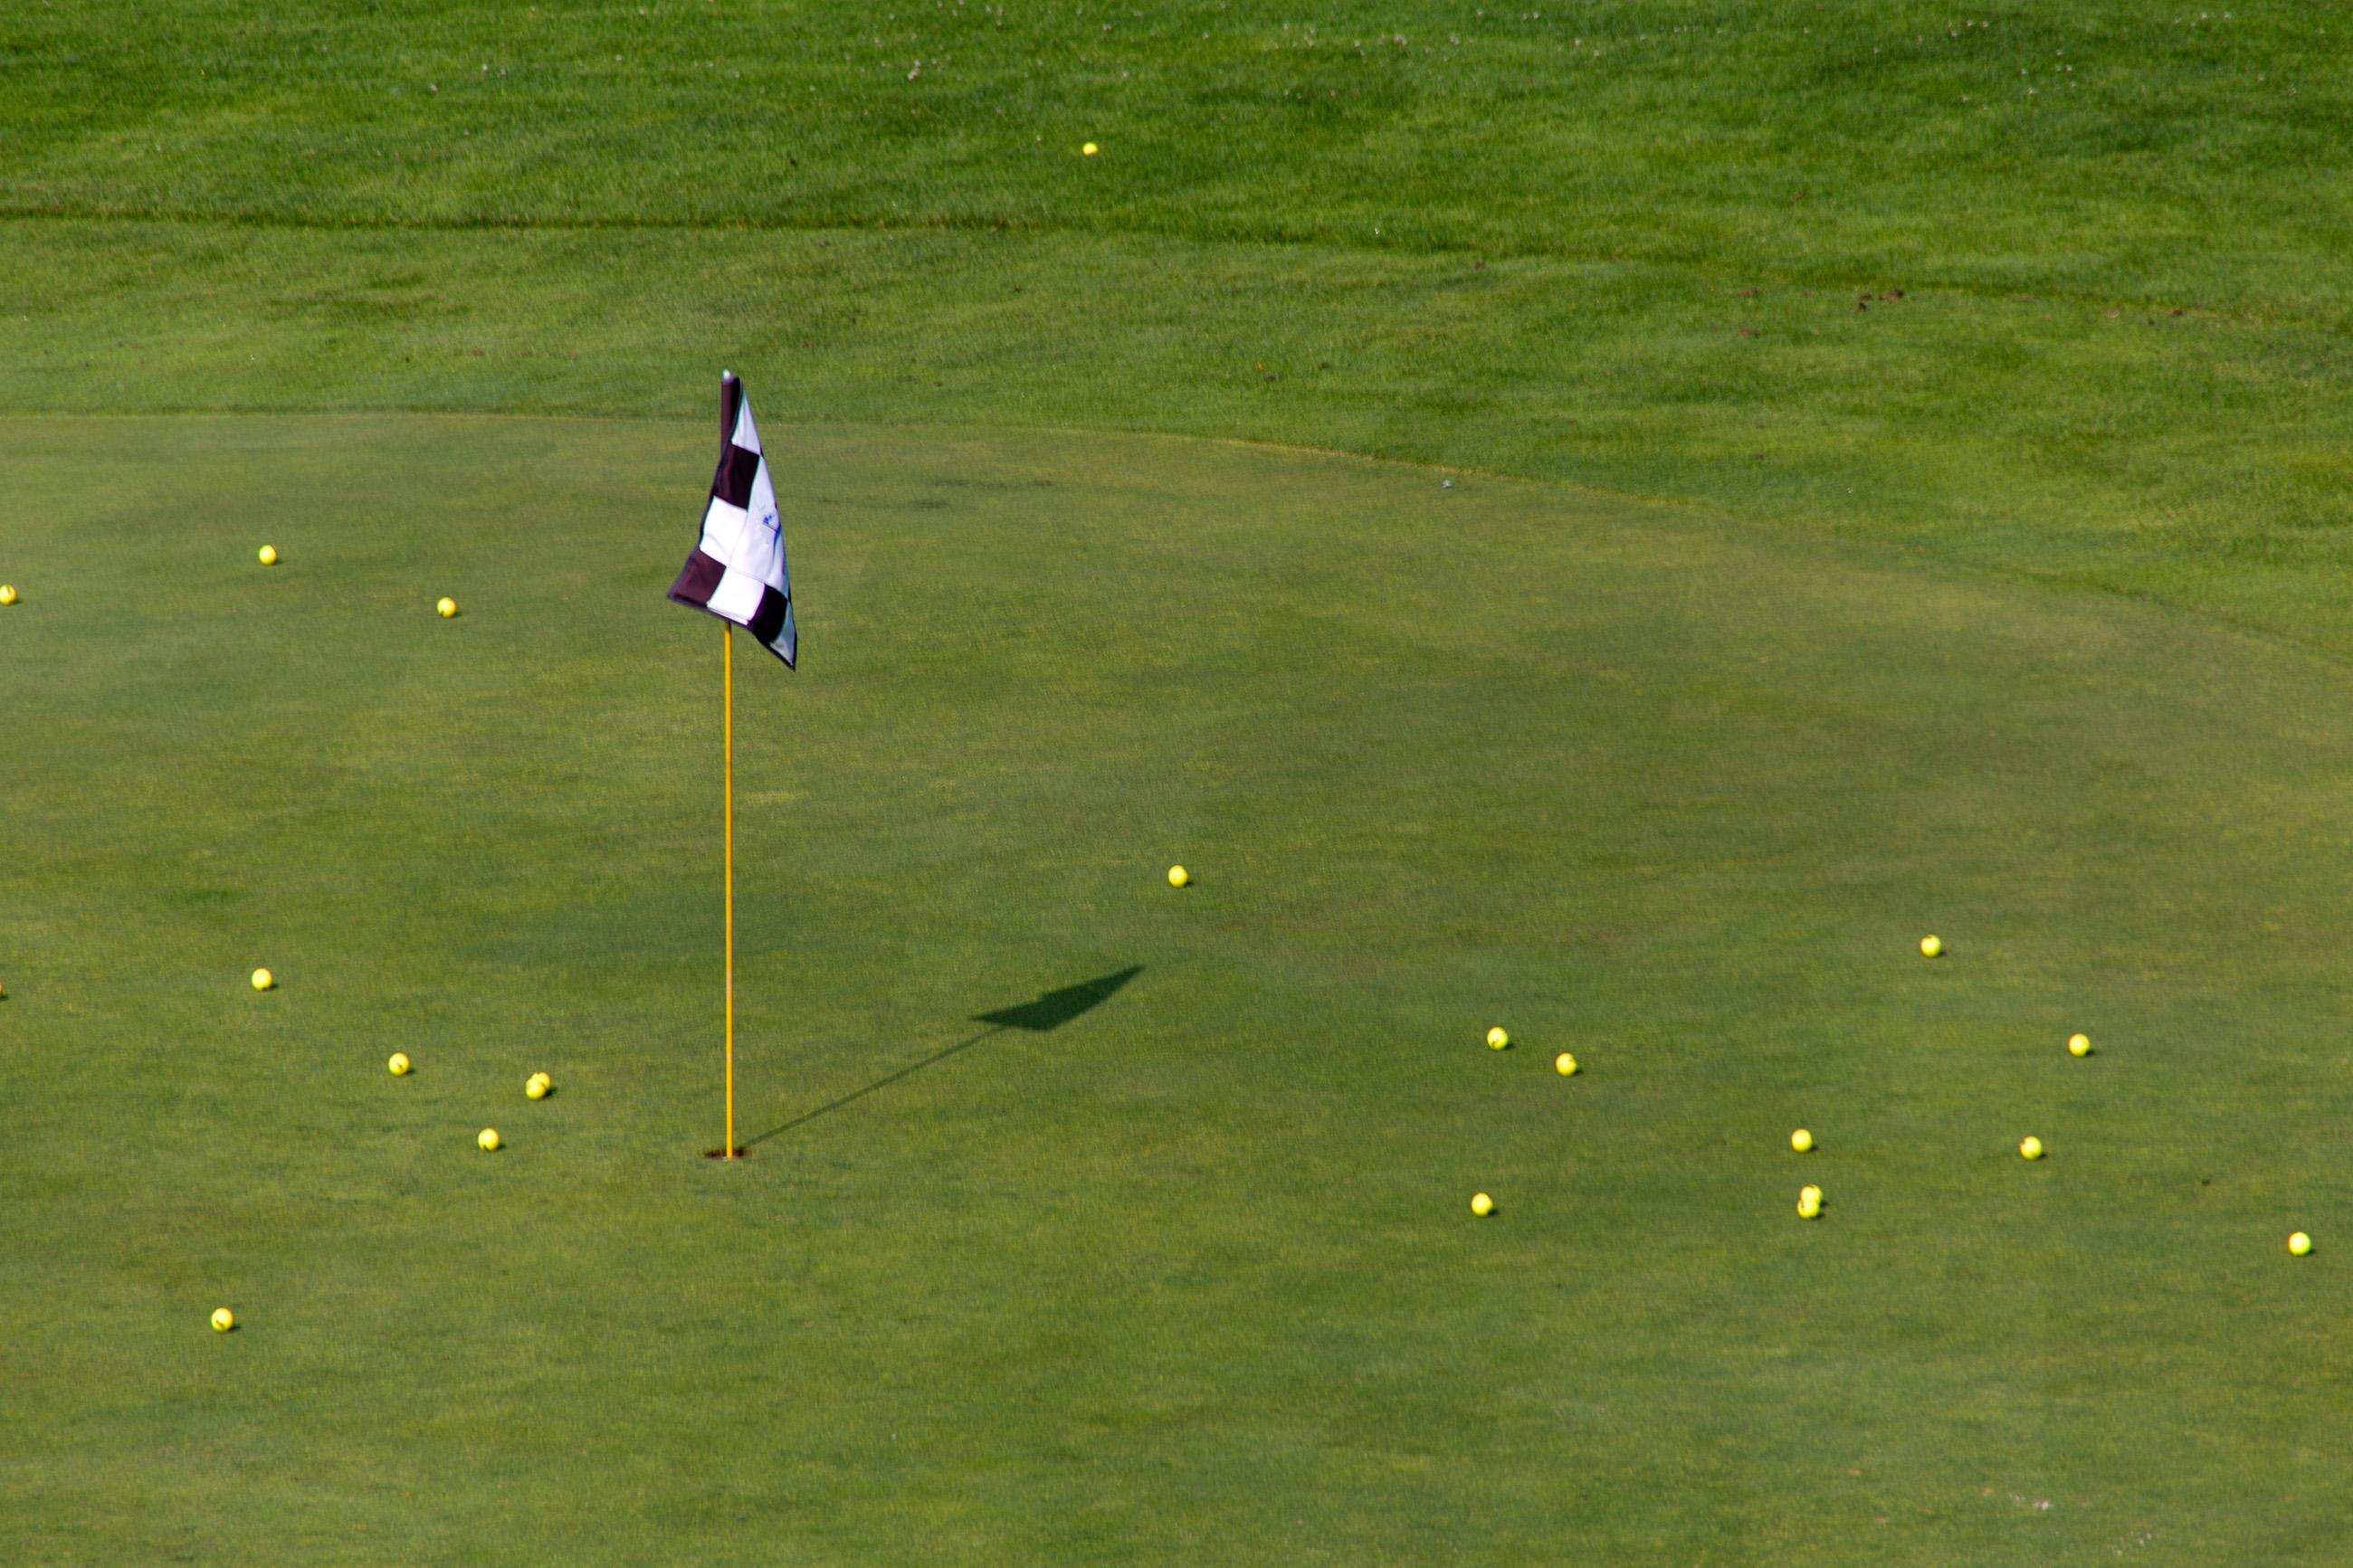 Golf, Rough, Outdoor, Park, Pastime, HQ Photo